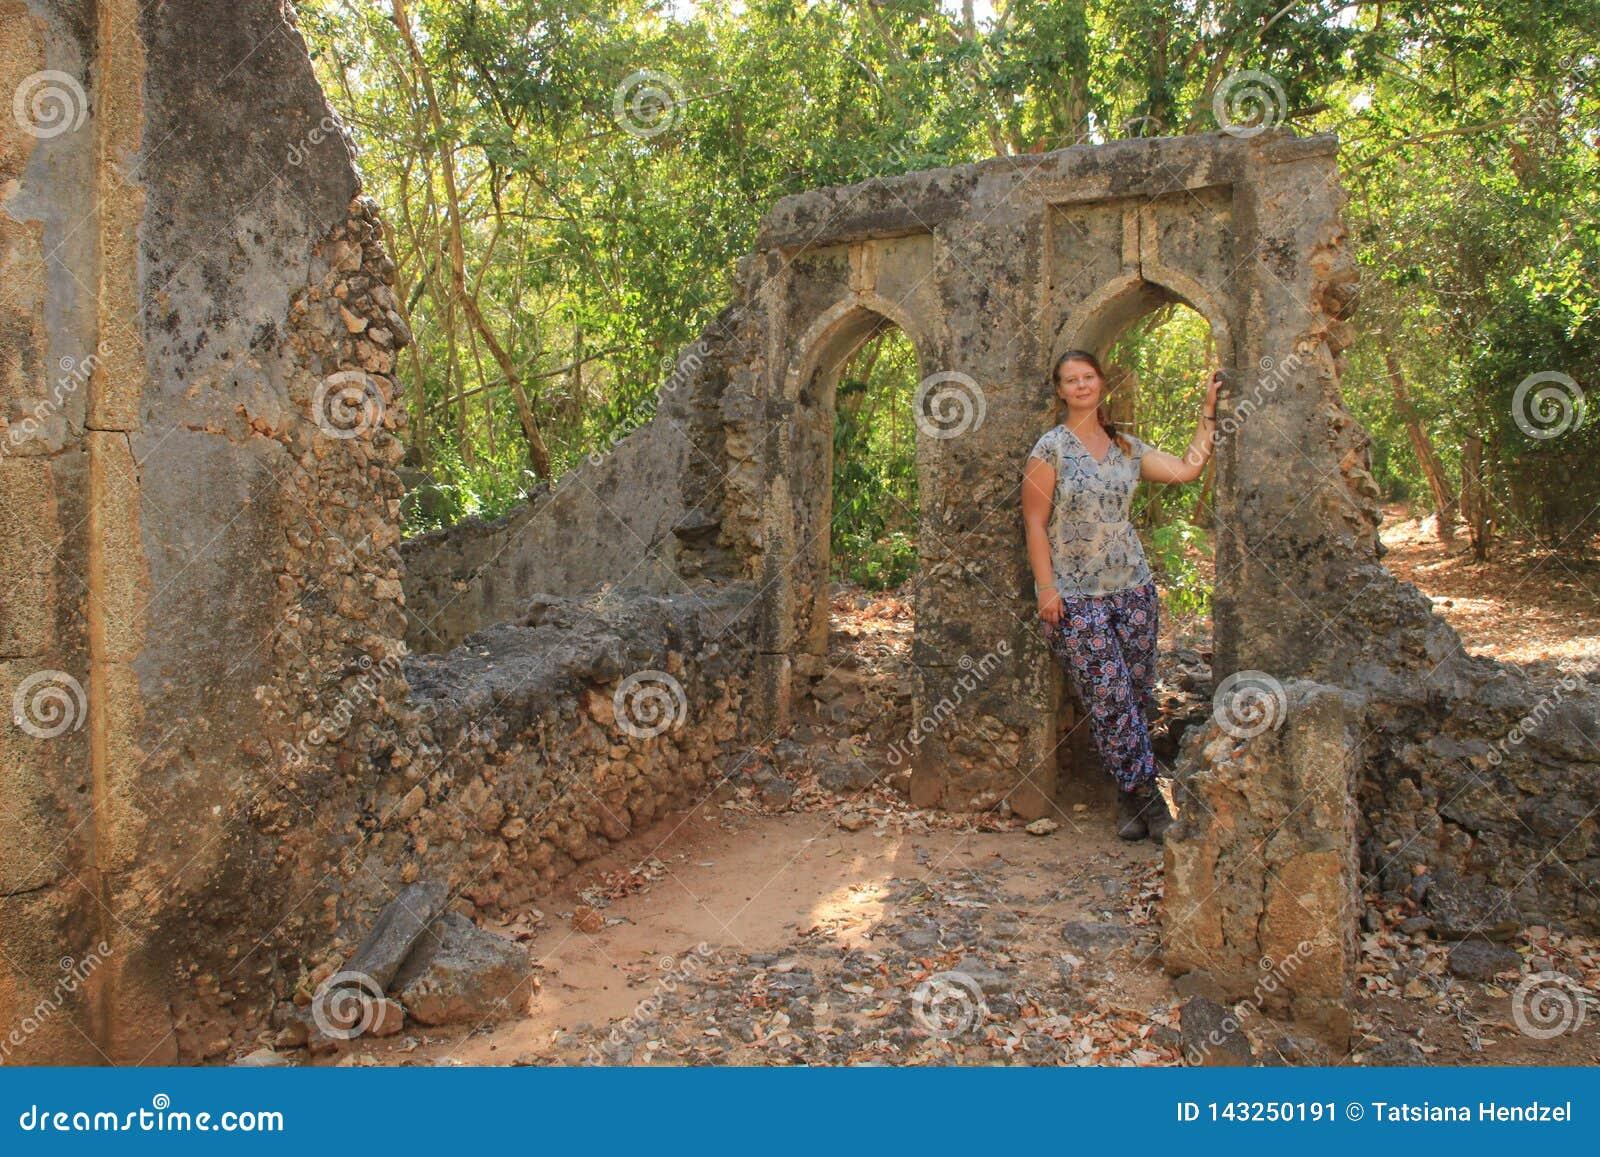 The ancient abandoned Arab city of Gede, near Malindi, Kenya. Classical Swahili architecture.